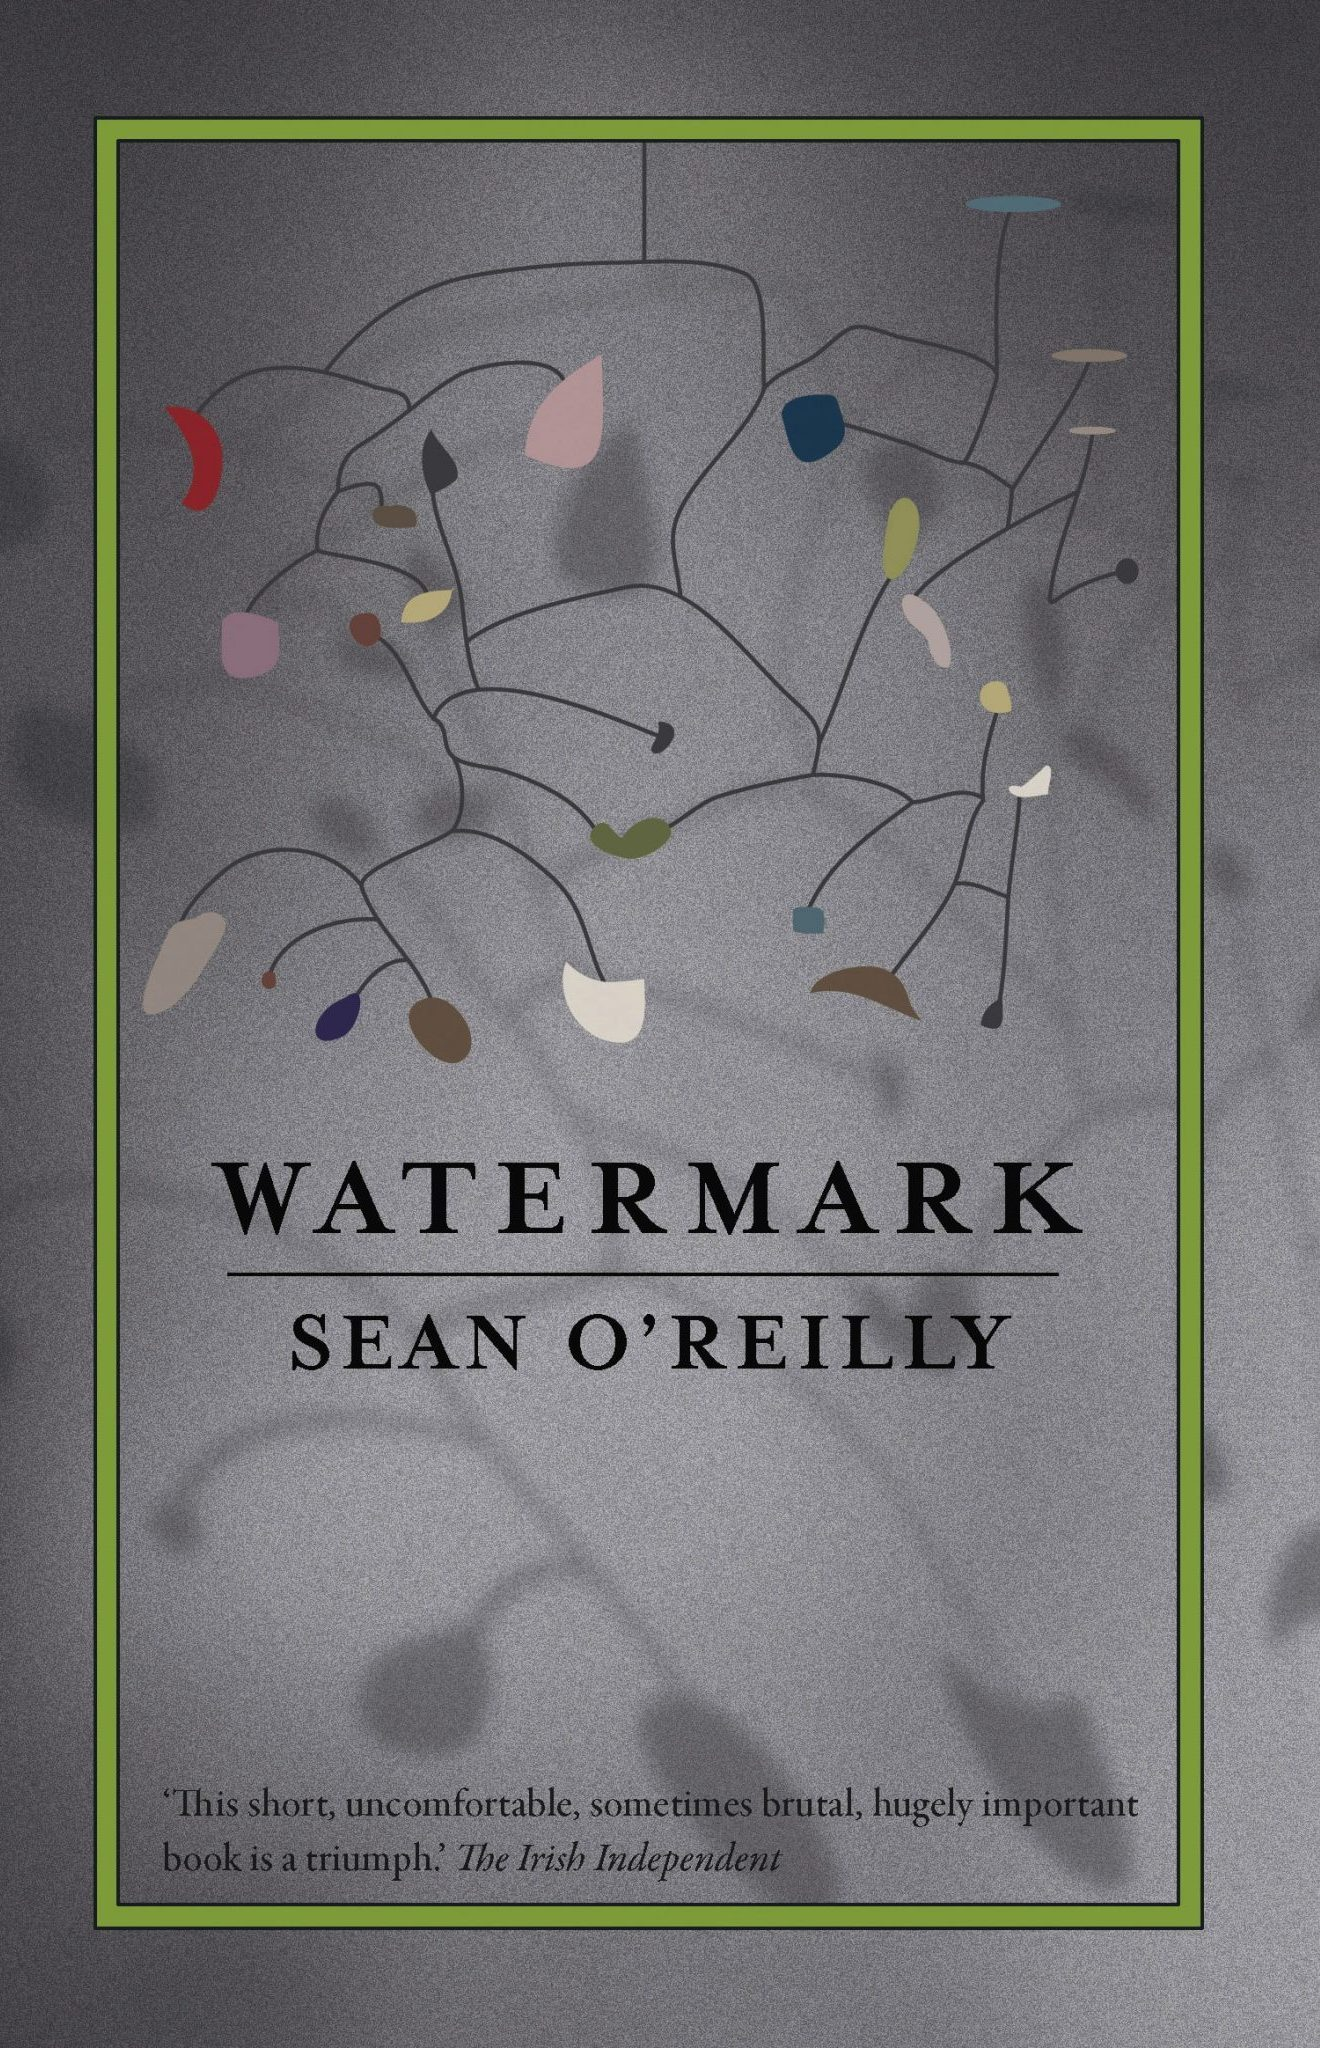 Watermark 2014 Front hi-res